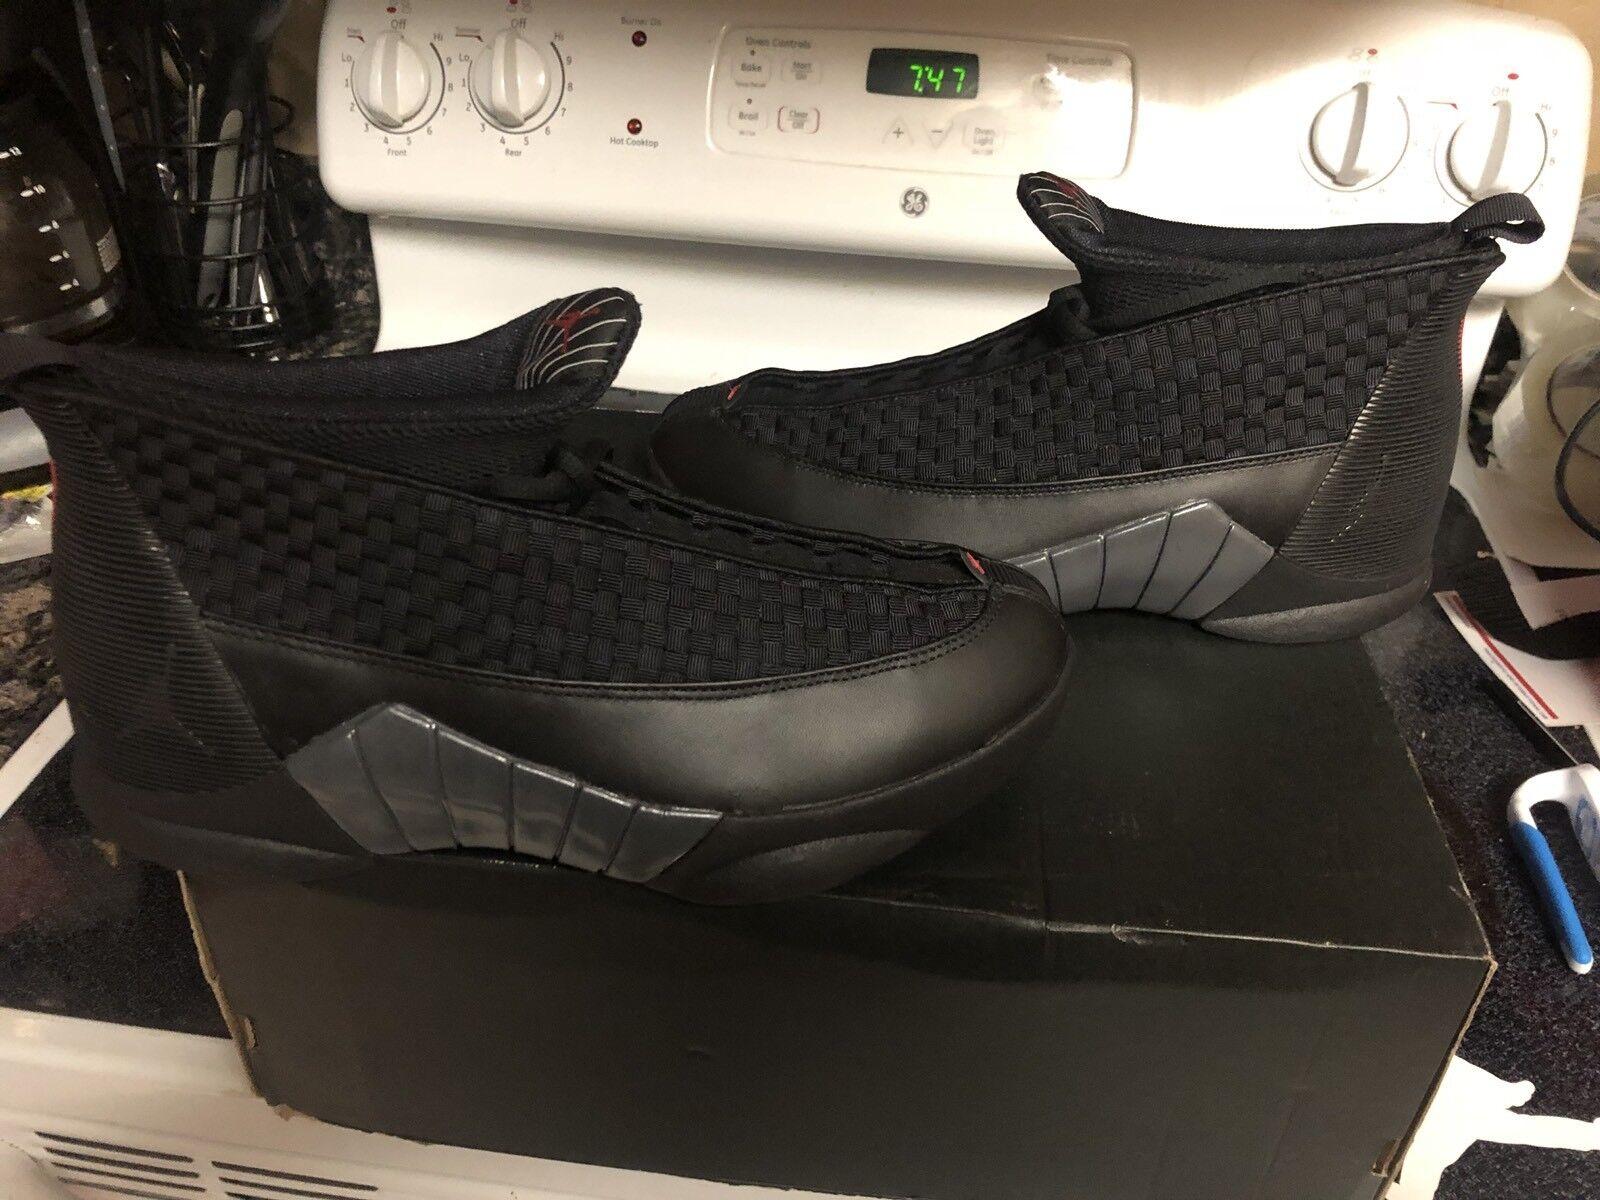 Nike Air Jordan XV 15 Retro Stealth 881429-001 Men's 10.5 1 Xi Xii Max 97 98